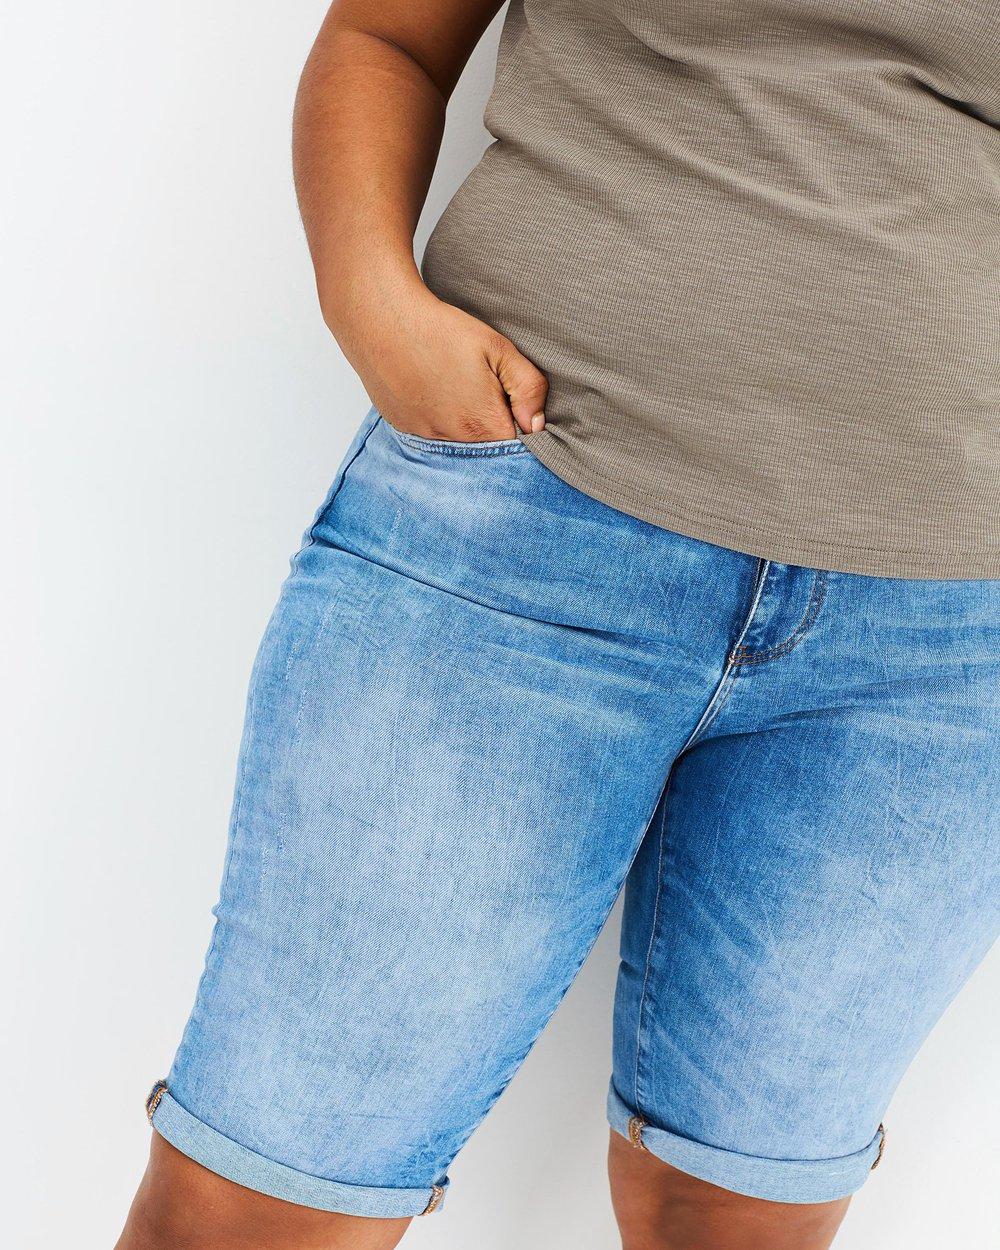 Five NW Slim Long Shorts